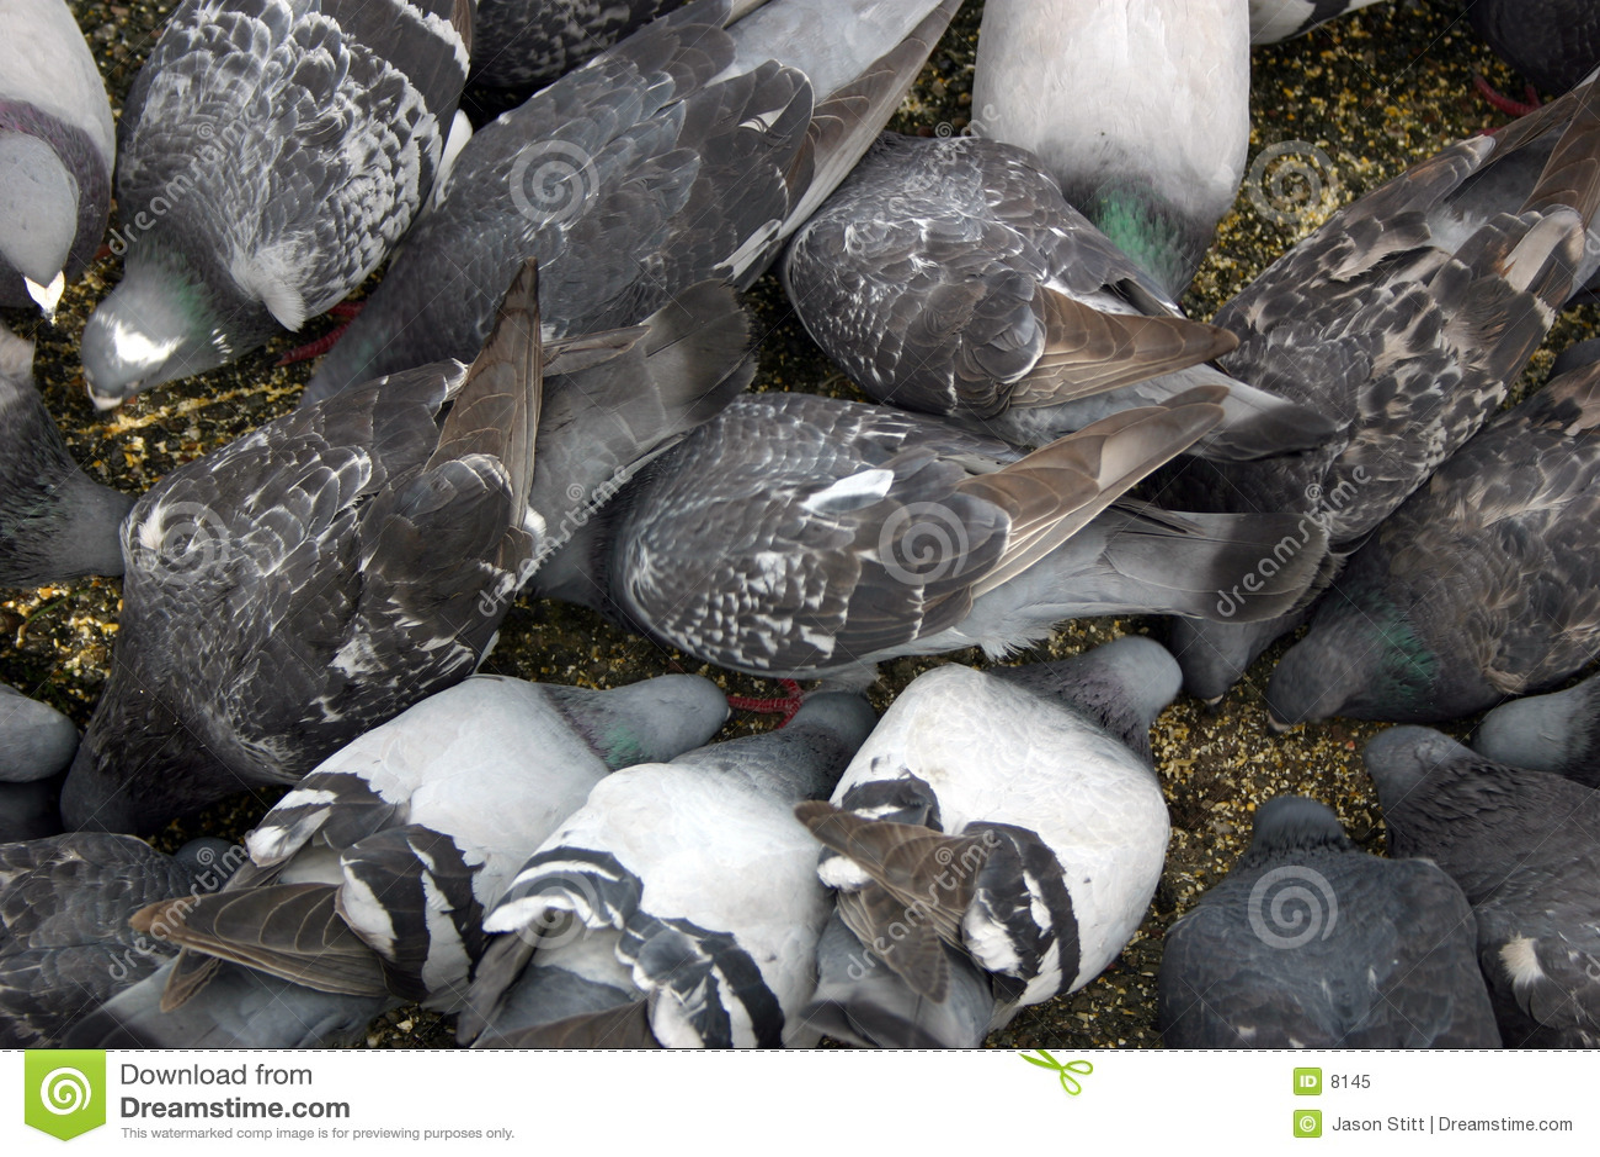 Download Uccelli immagine stock. Immagine di animali, uccelli, fame - 8145